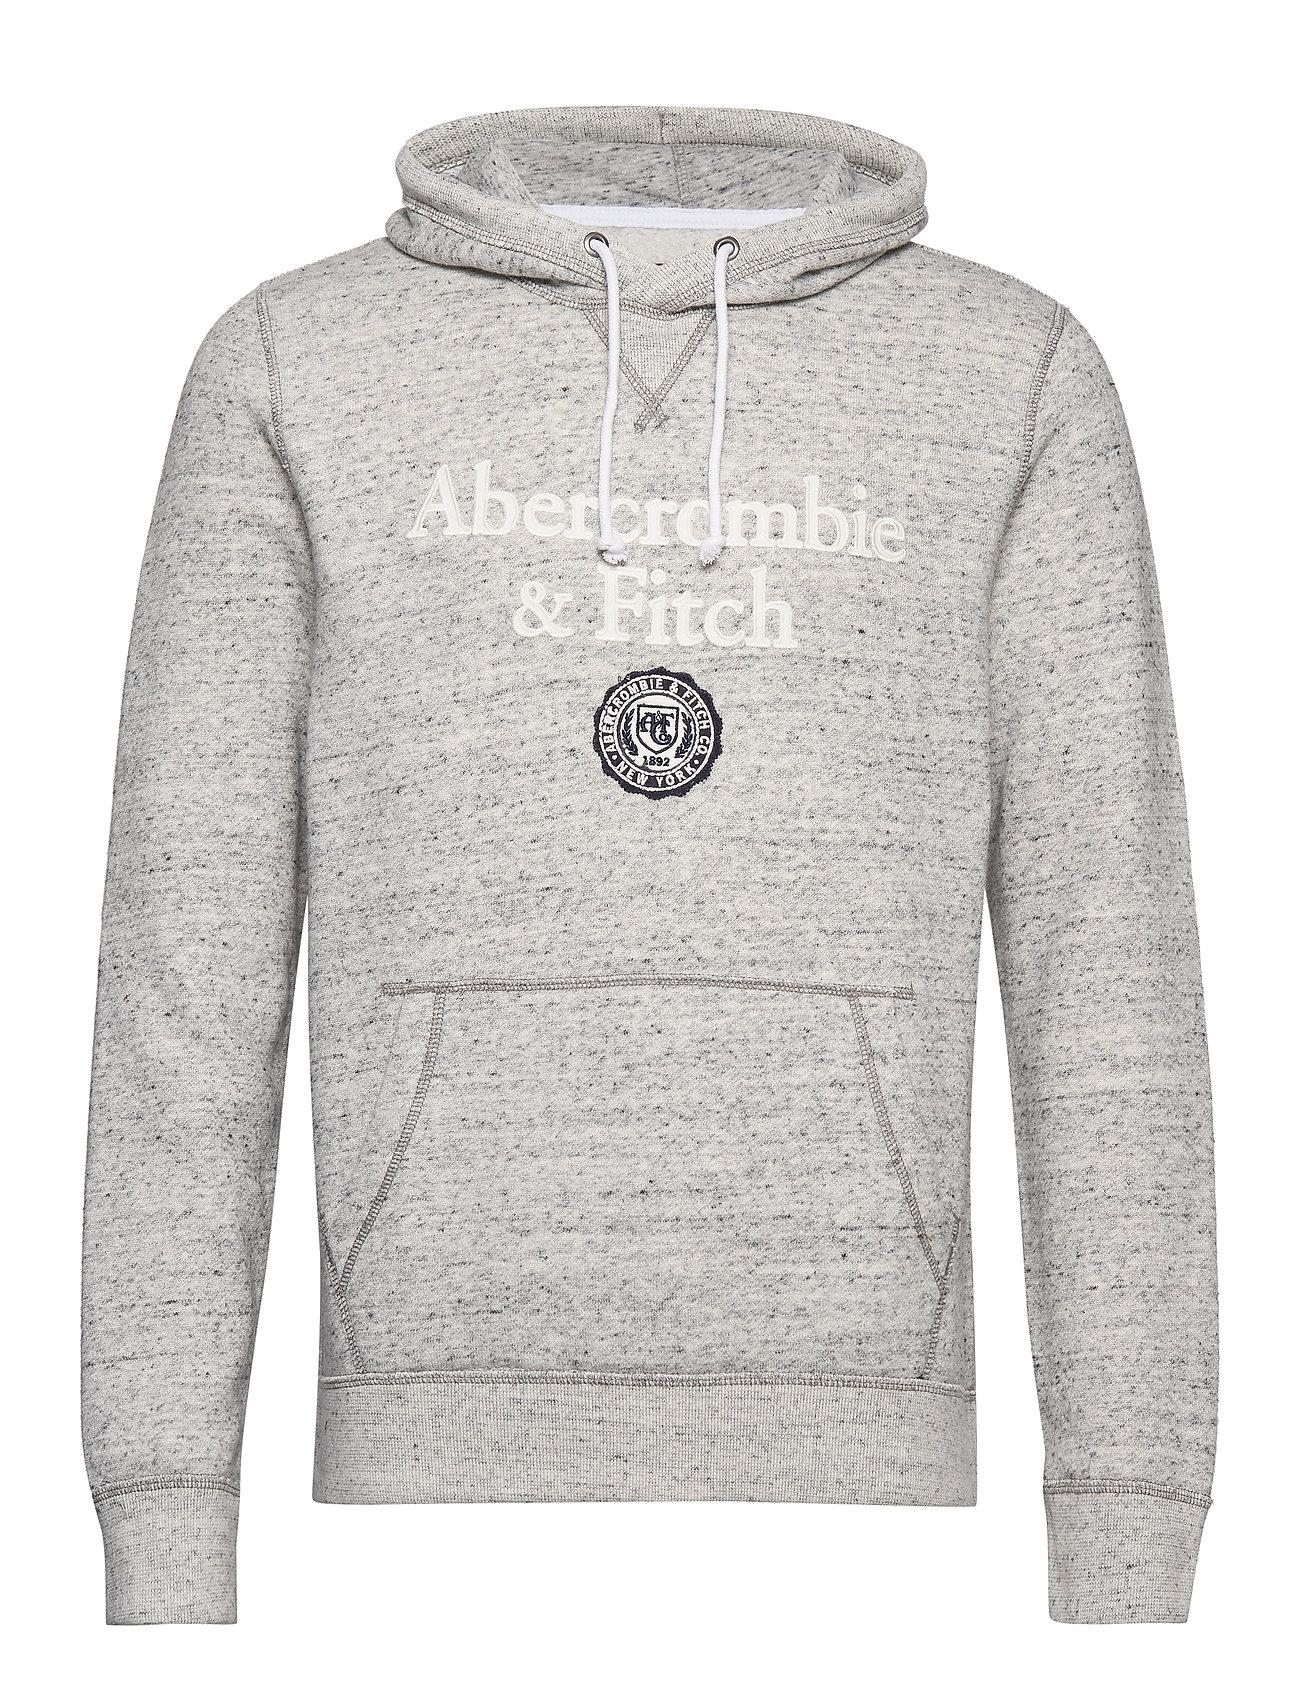 Abercrombie & Fitch Sweatshirt Logo - MED GREY SD/TEXTURE